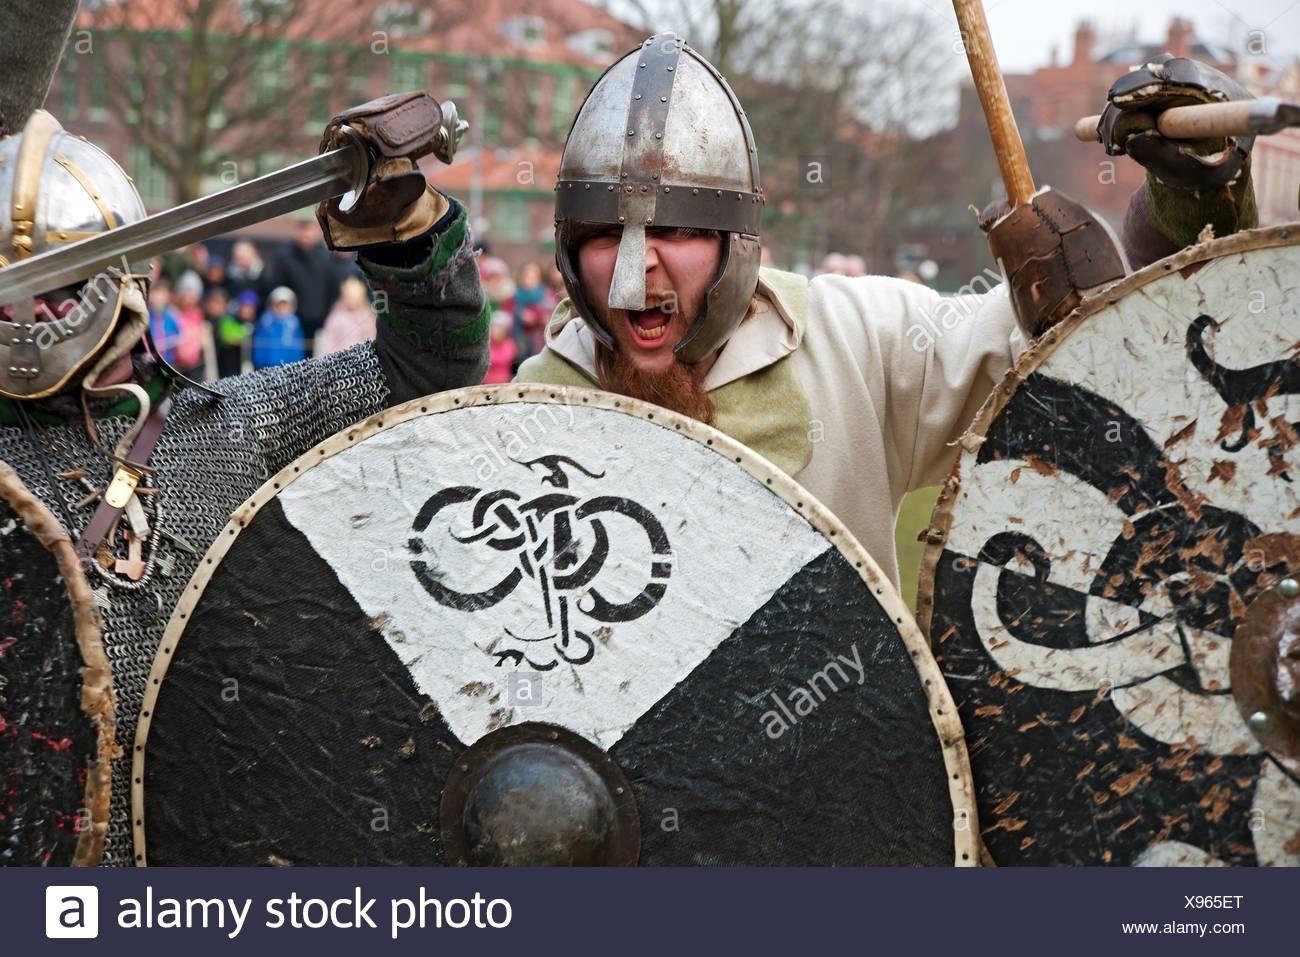 Vikings and Anglo Saxons at the Viking Festival York North Yorkshire England UK United Kingdom GB Great Britain. - Stock Image